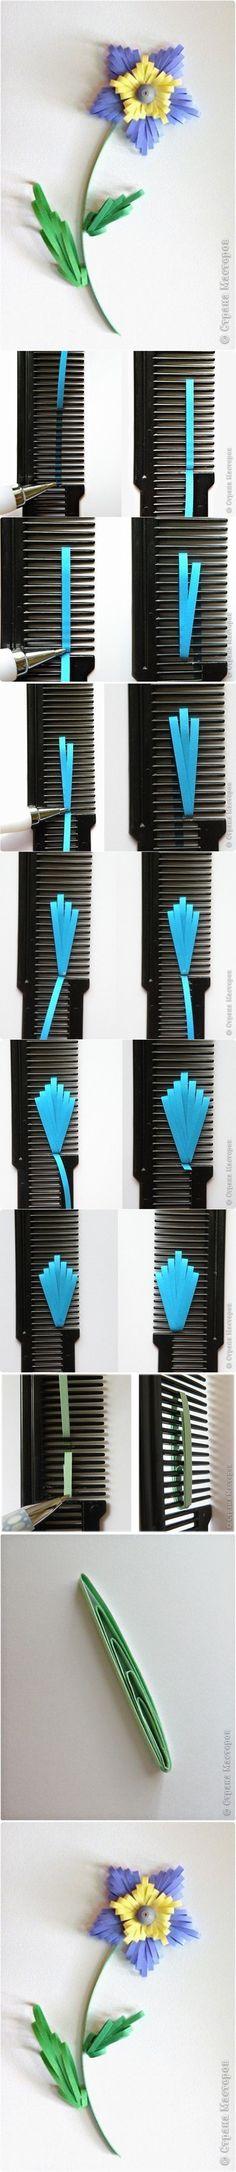 DIY Quilled Flower with Comb | www.FabArtDIY.com LIKE Us on Facebook ==> https://www.facebook.com/FabArtDIY